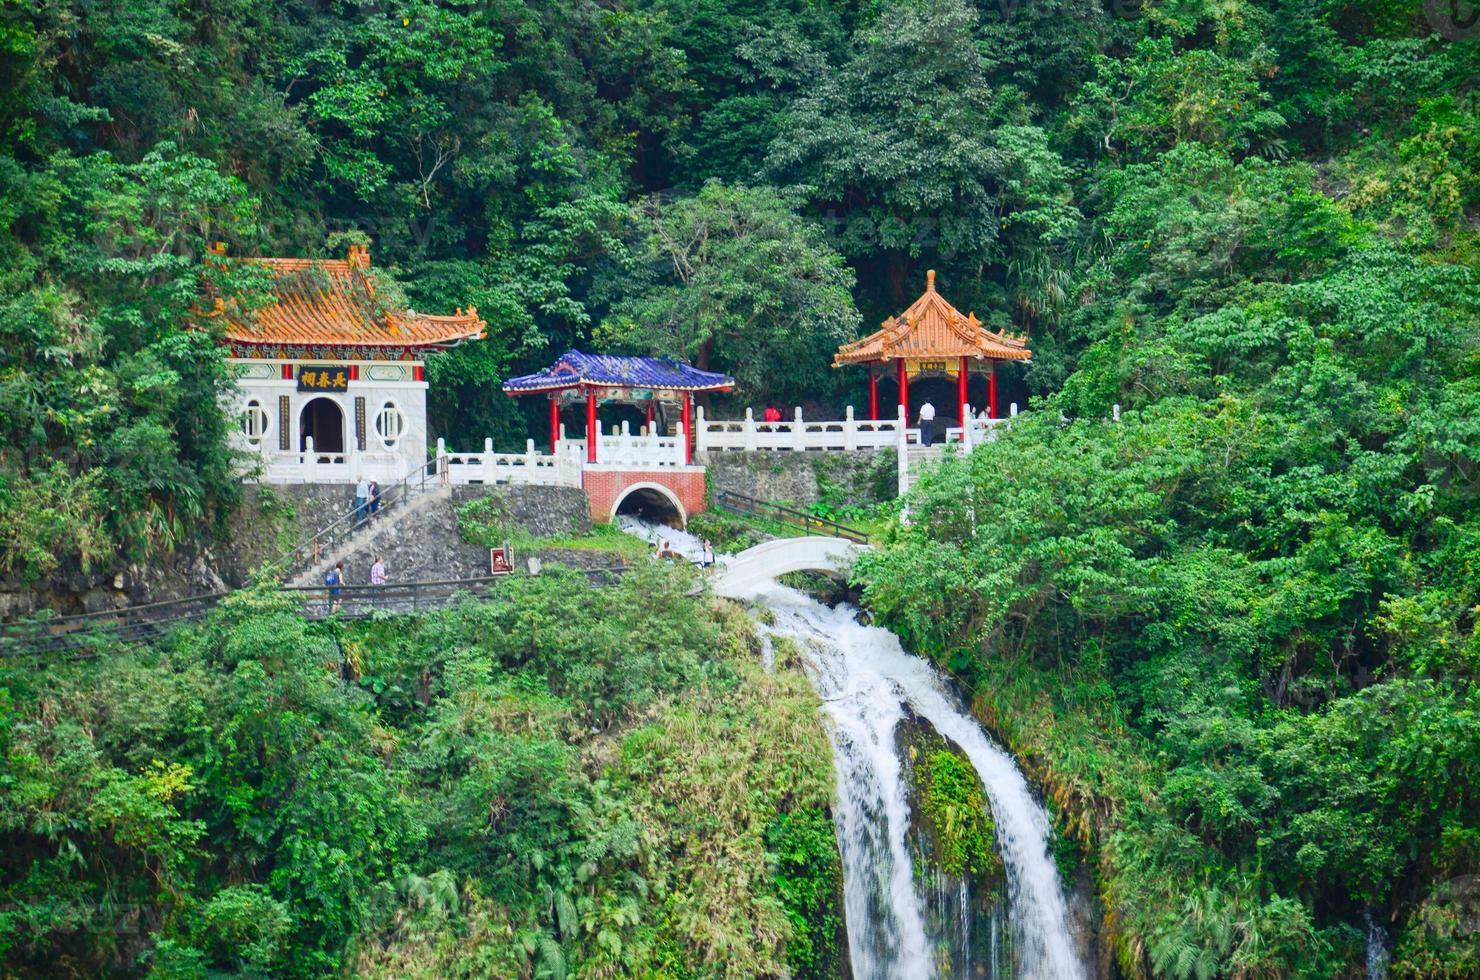 parque nacional de taiwán taroko - santuario changchun (primavera eterna) foto